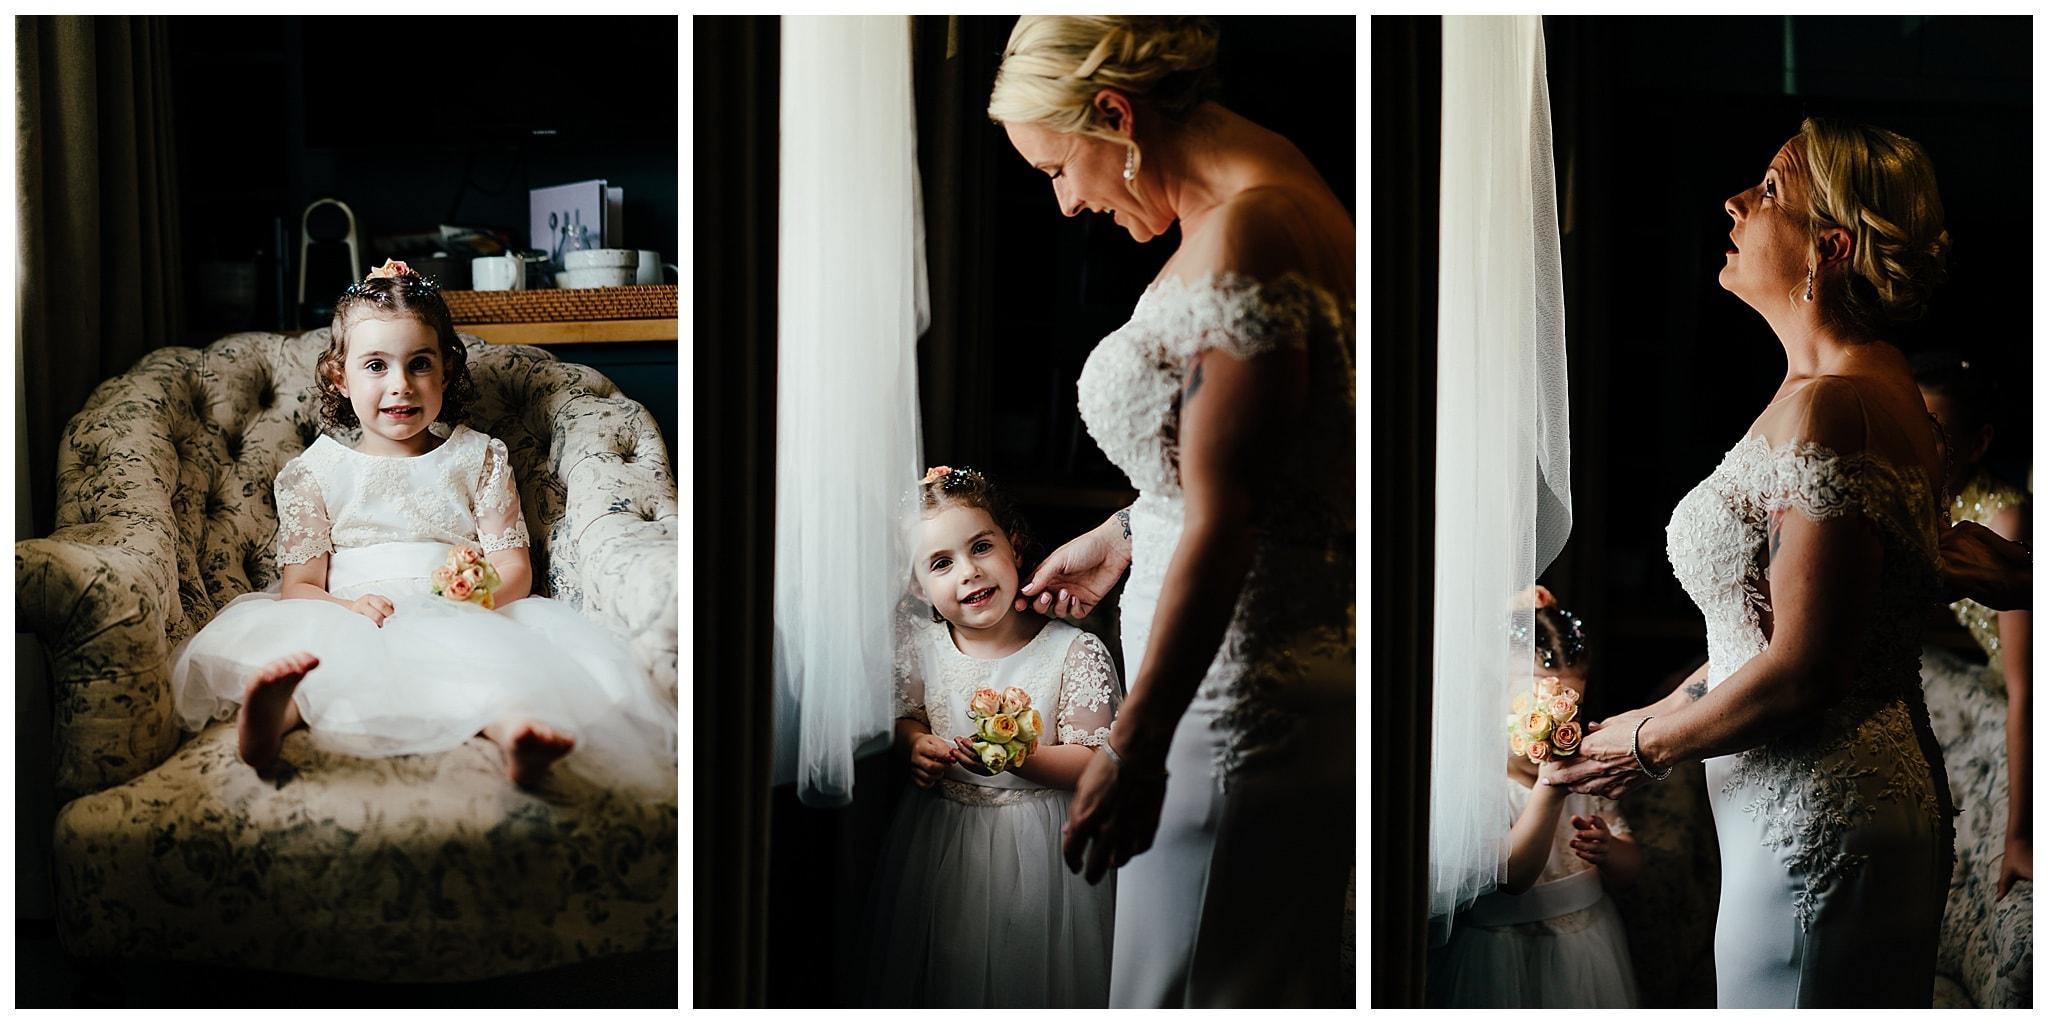 horsebridge station wedding photographer_0240